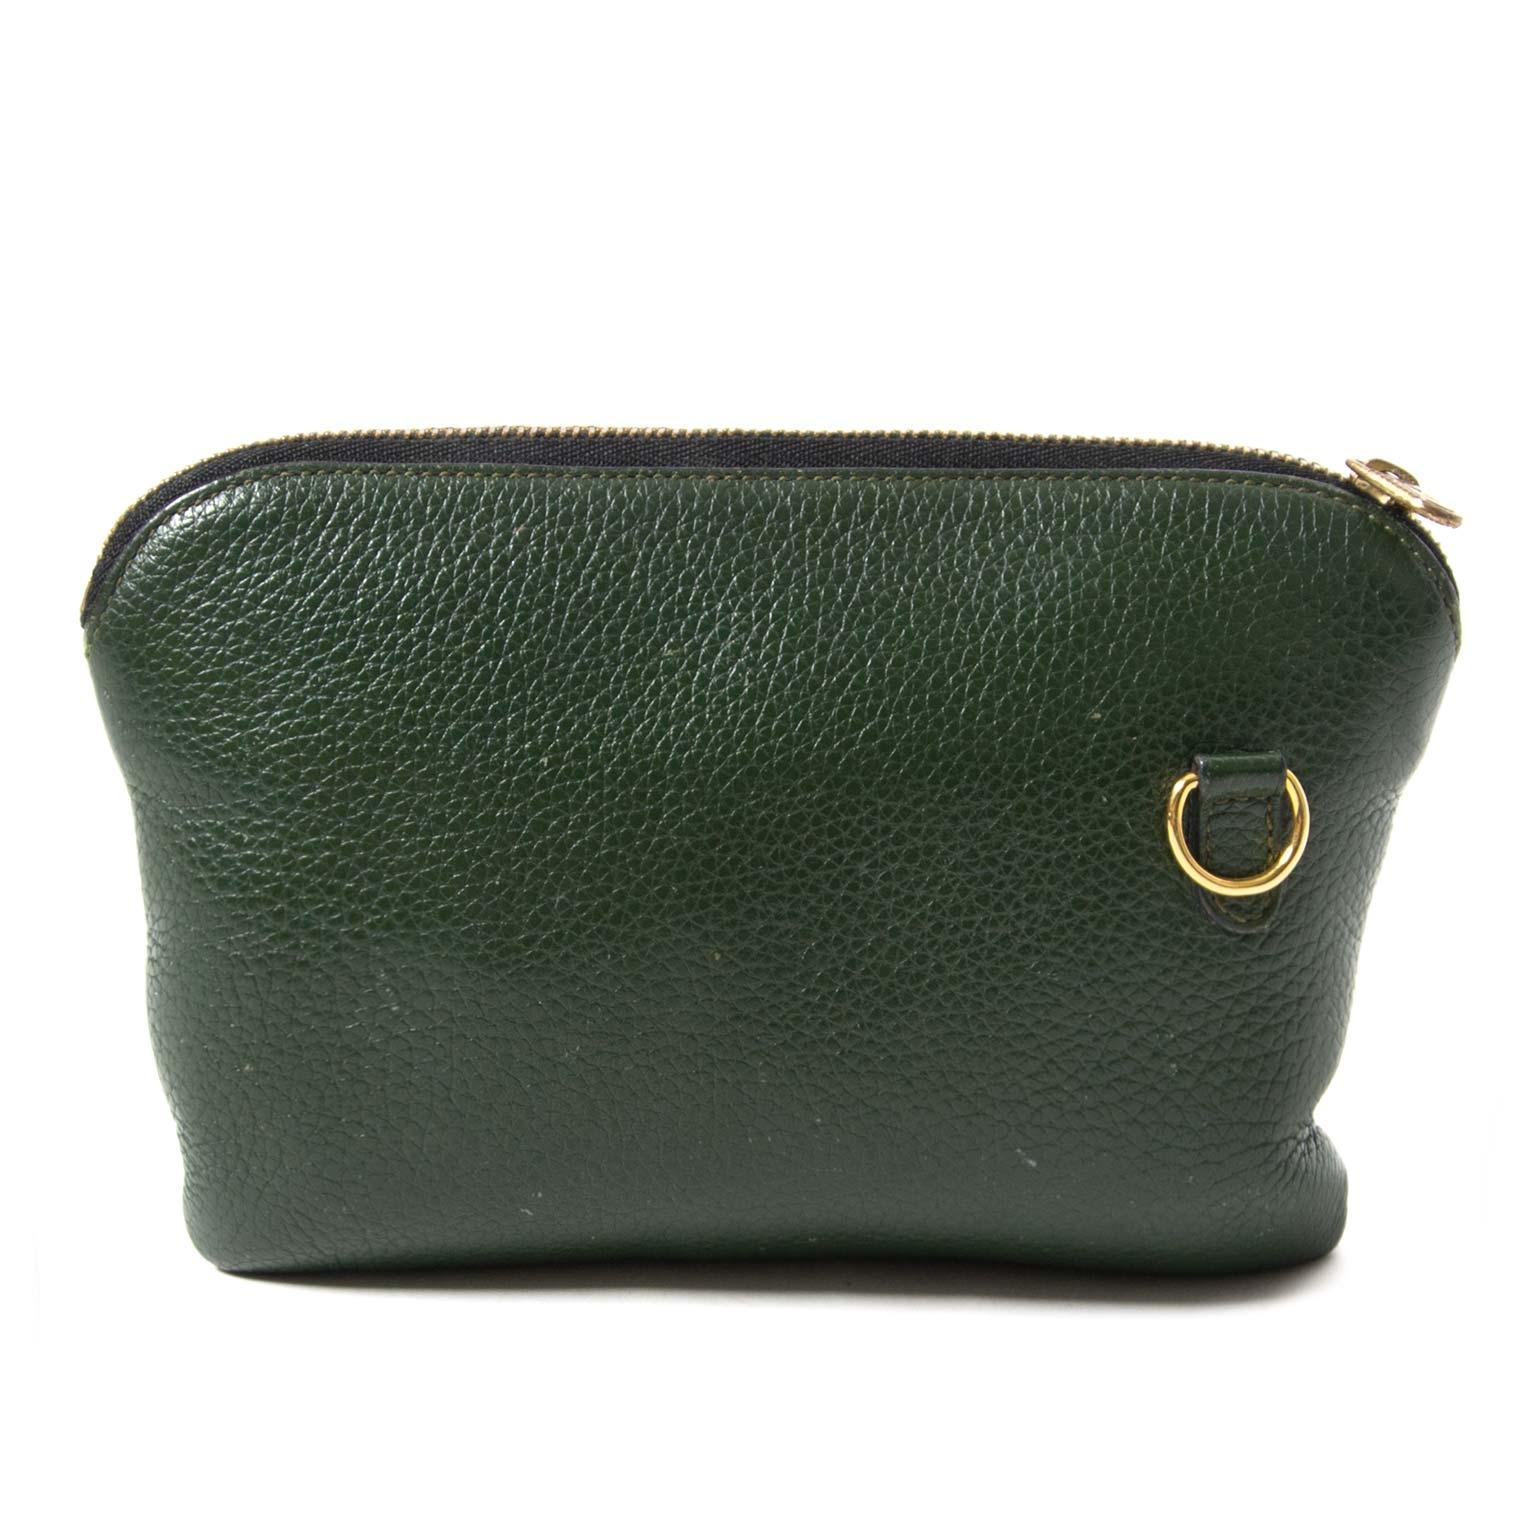 delvaux green pochette now for sale at labellov vintage fashion webshop belgium